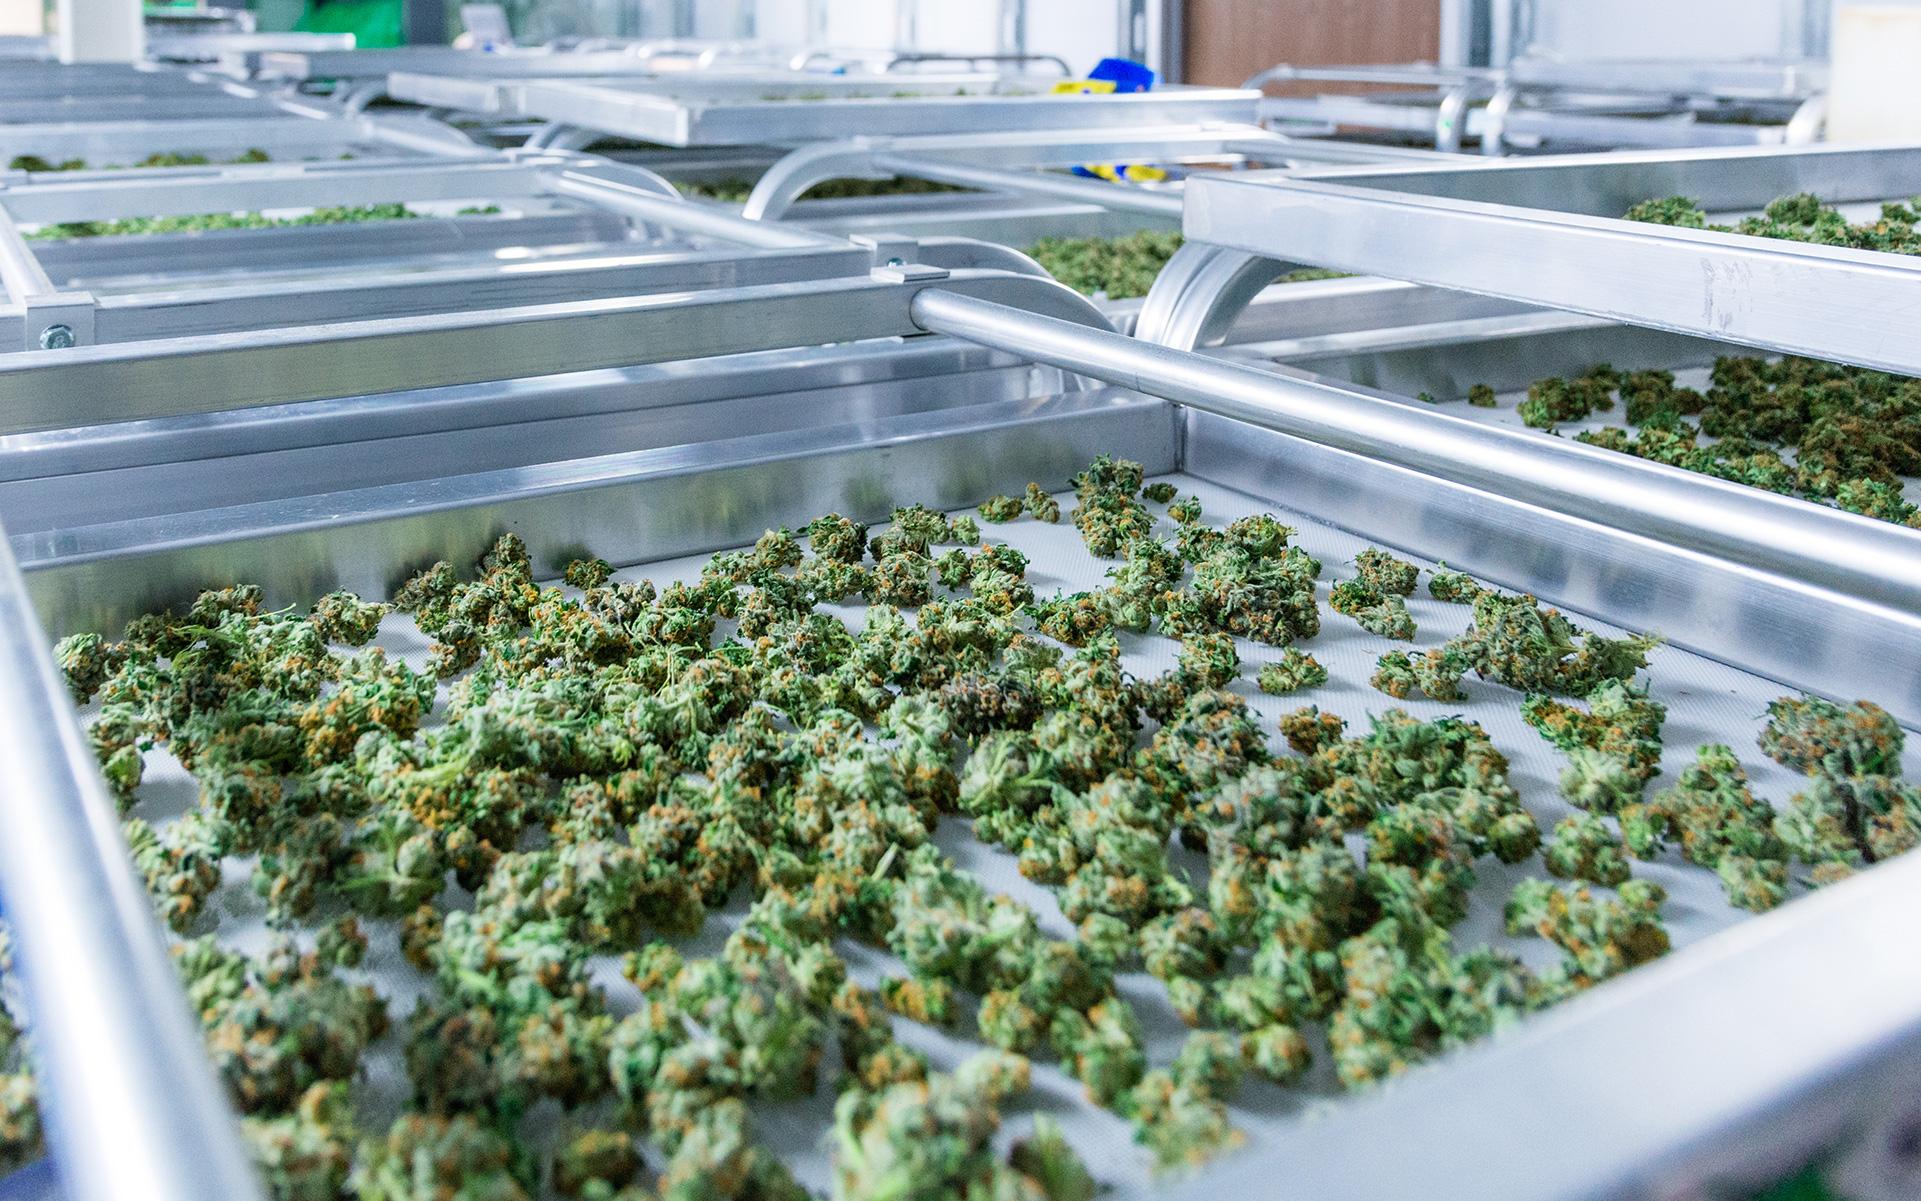 drying curing cannabis, marijuana, harvesting marijuana